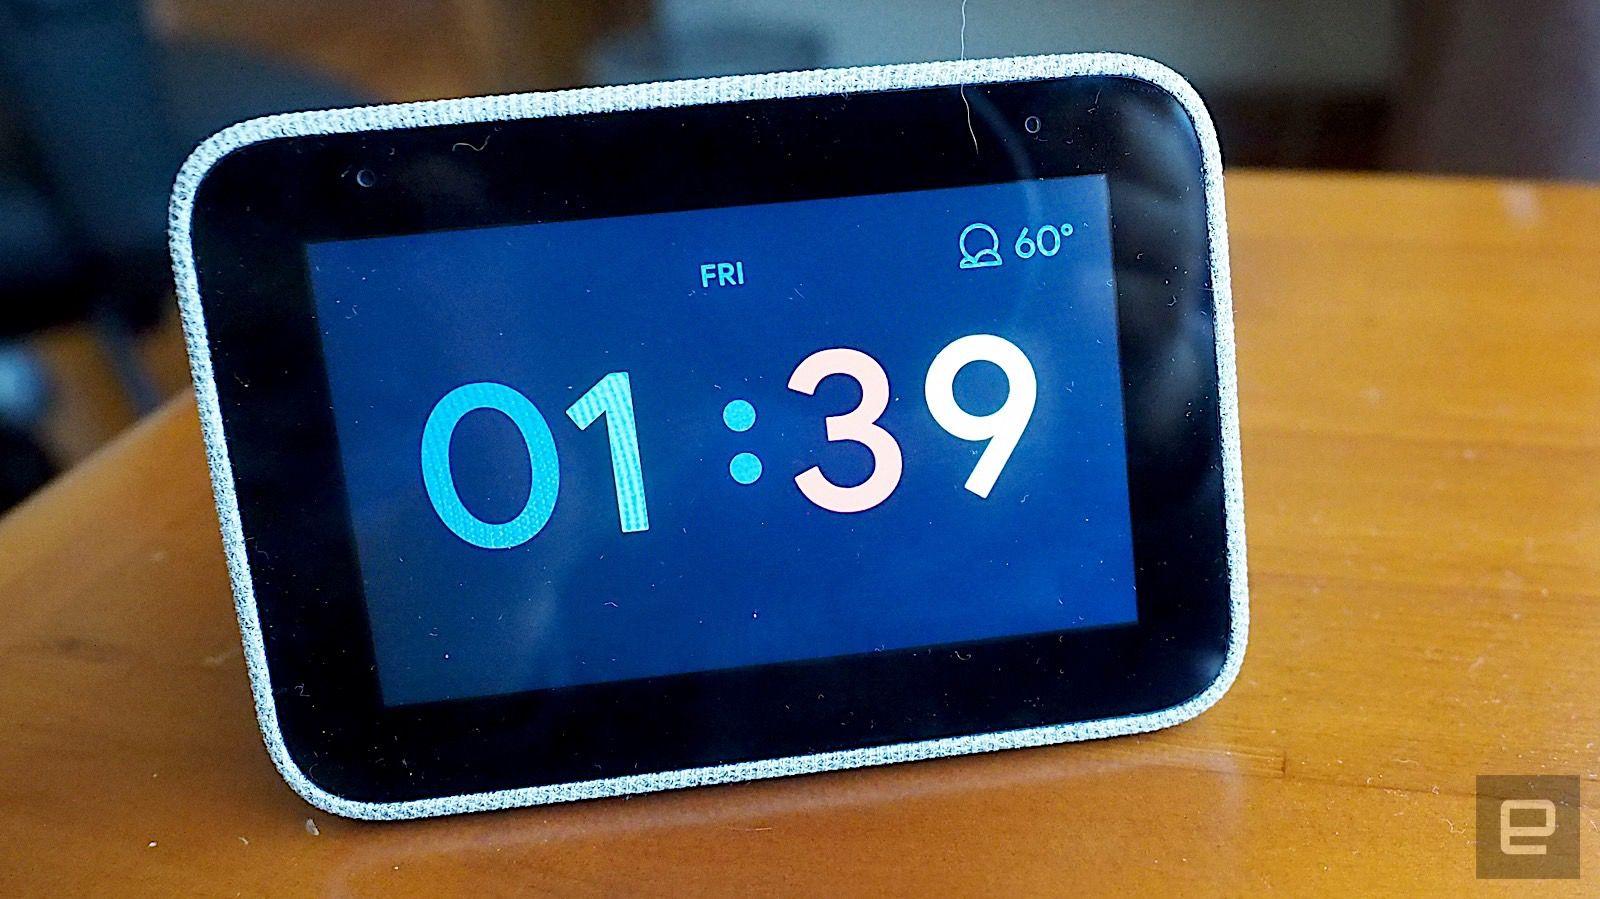 Lenovo's Google-powered Smart Clock drops to $40 at Best Buy #rwanda #RwOT Benfica